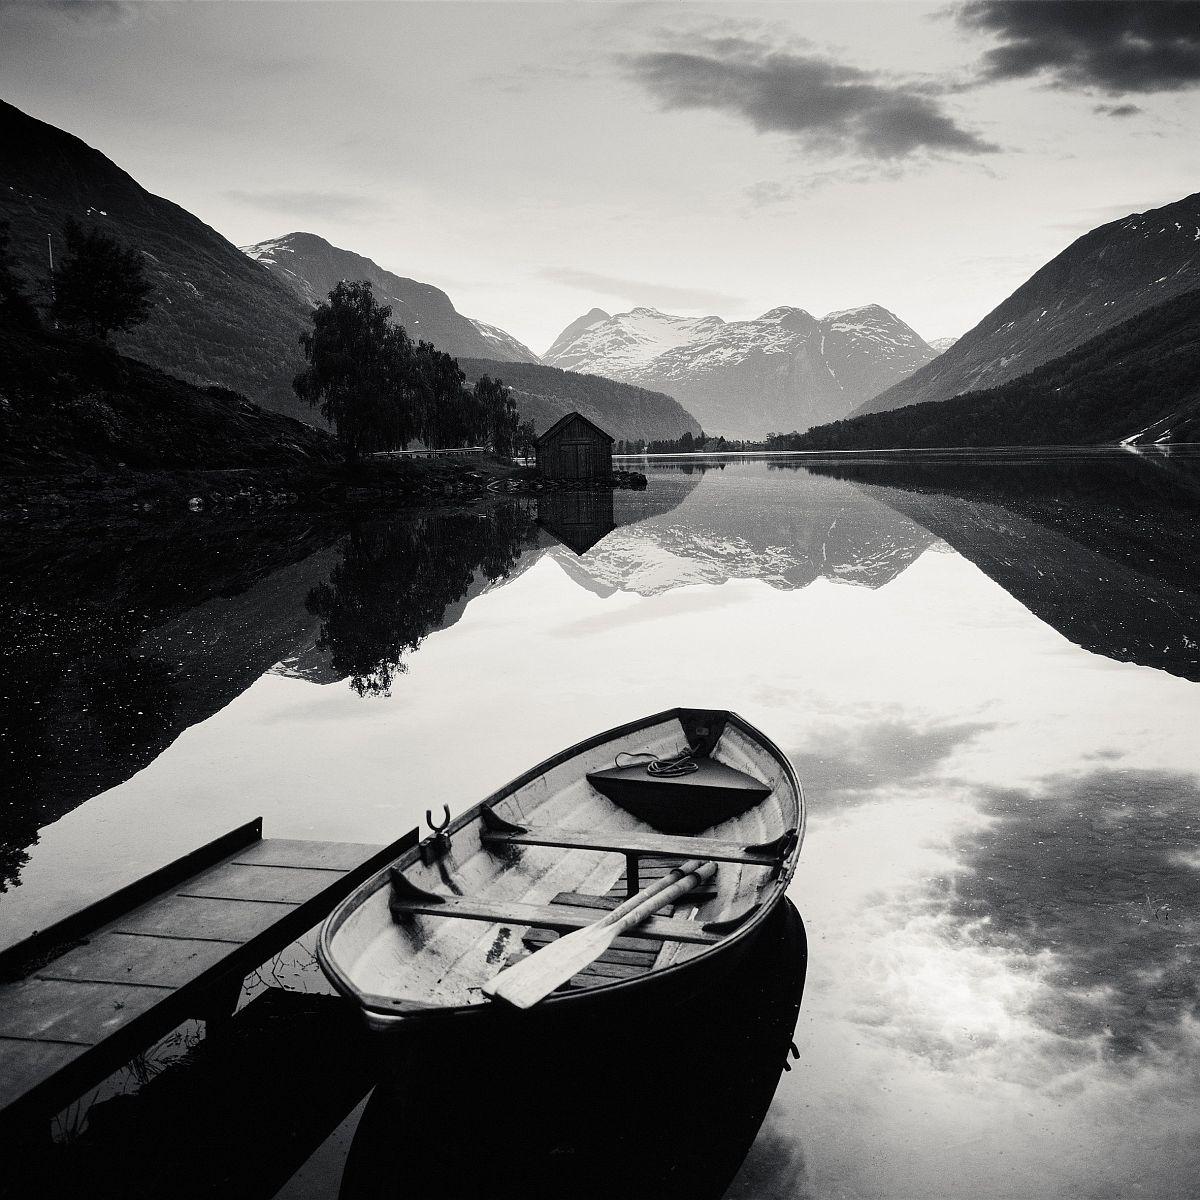 © Josef Hoflehner